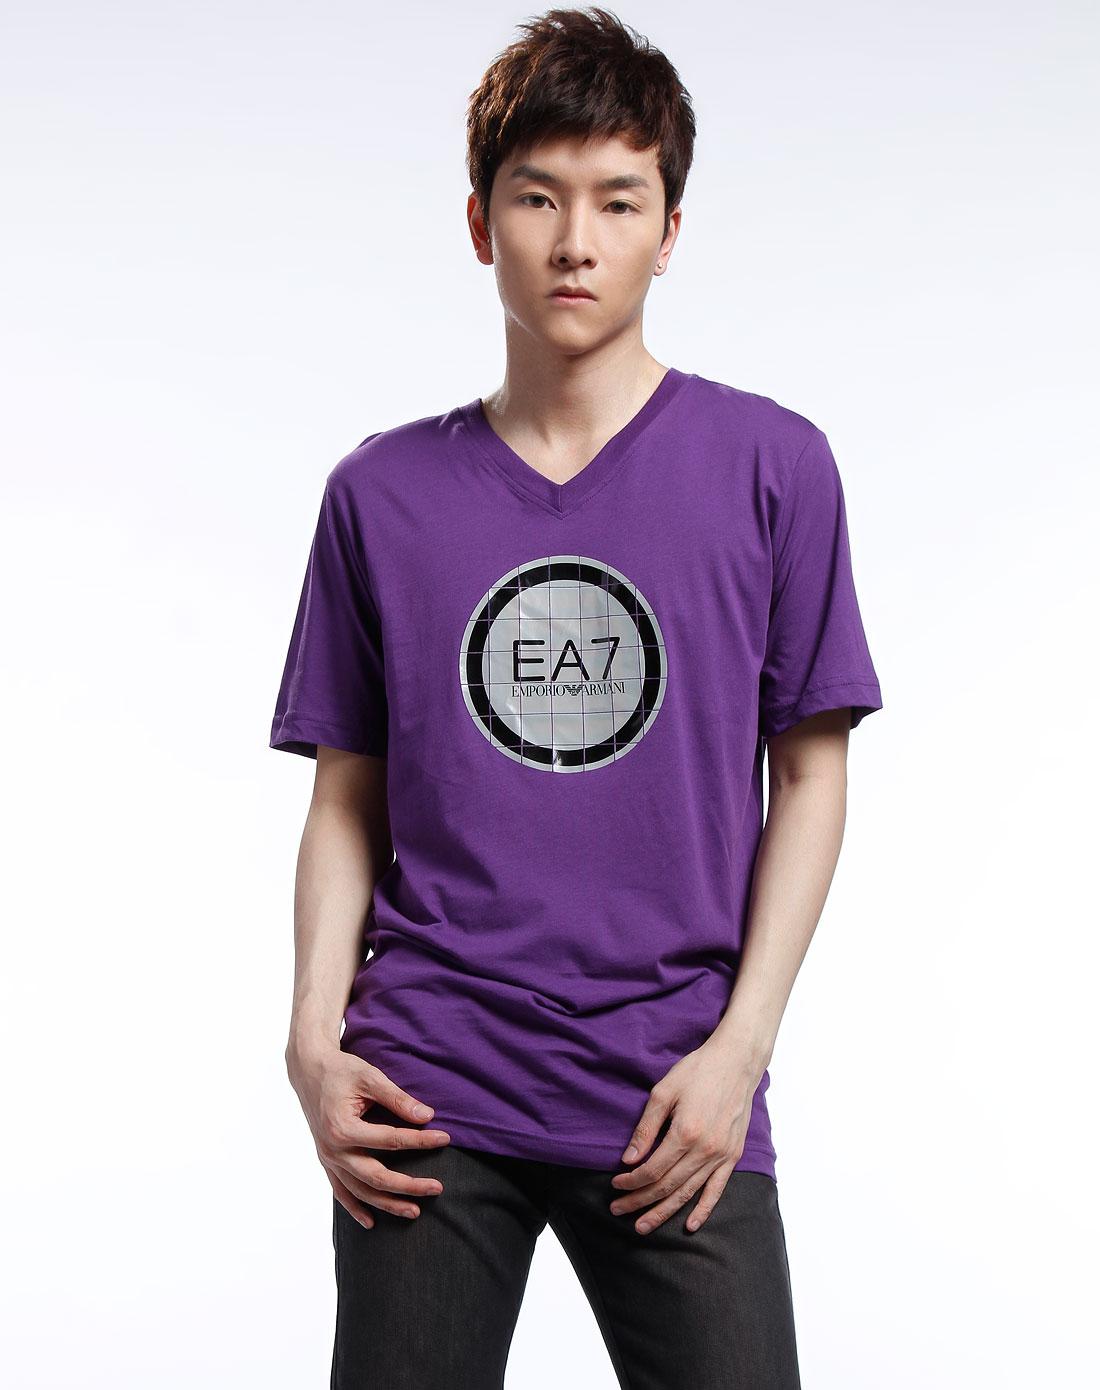 ea7男款紫色图案短袖t恤